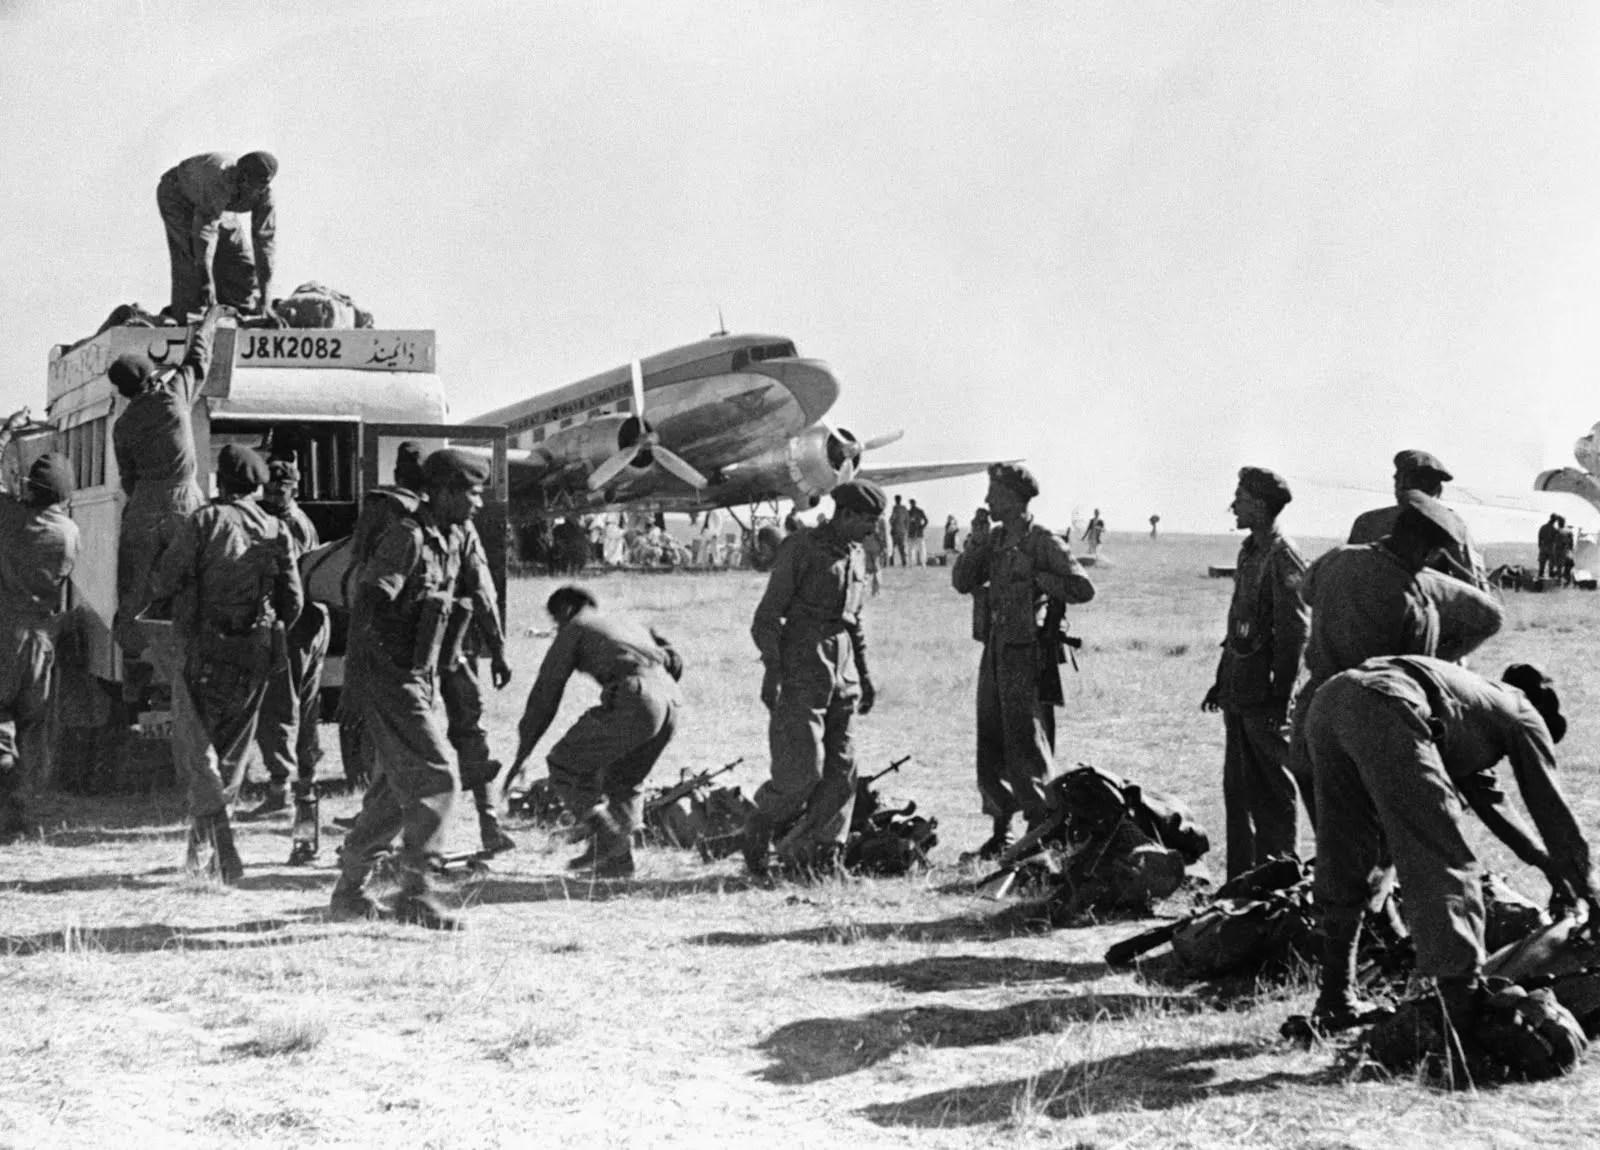 Indian Troops In Srinagar Kashmir Airport Oct 27